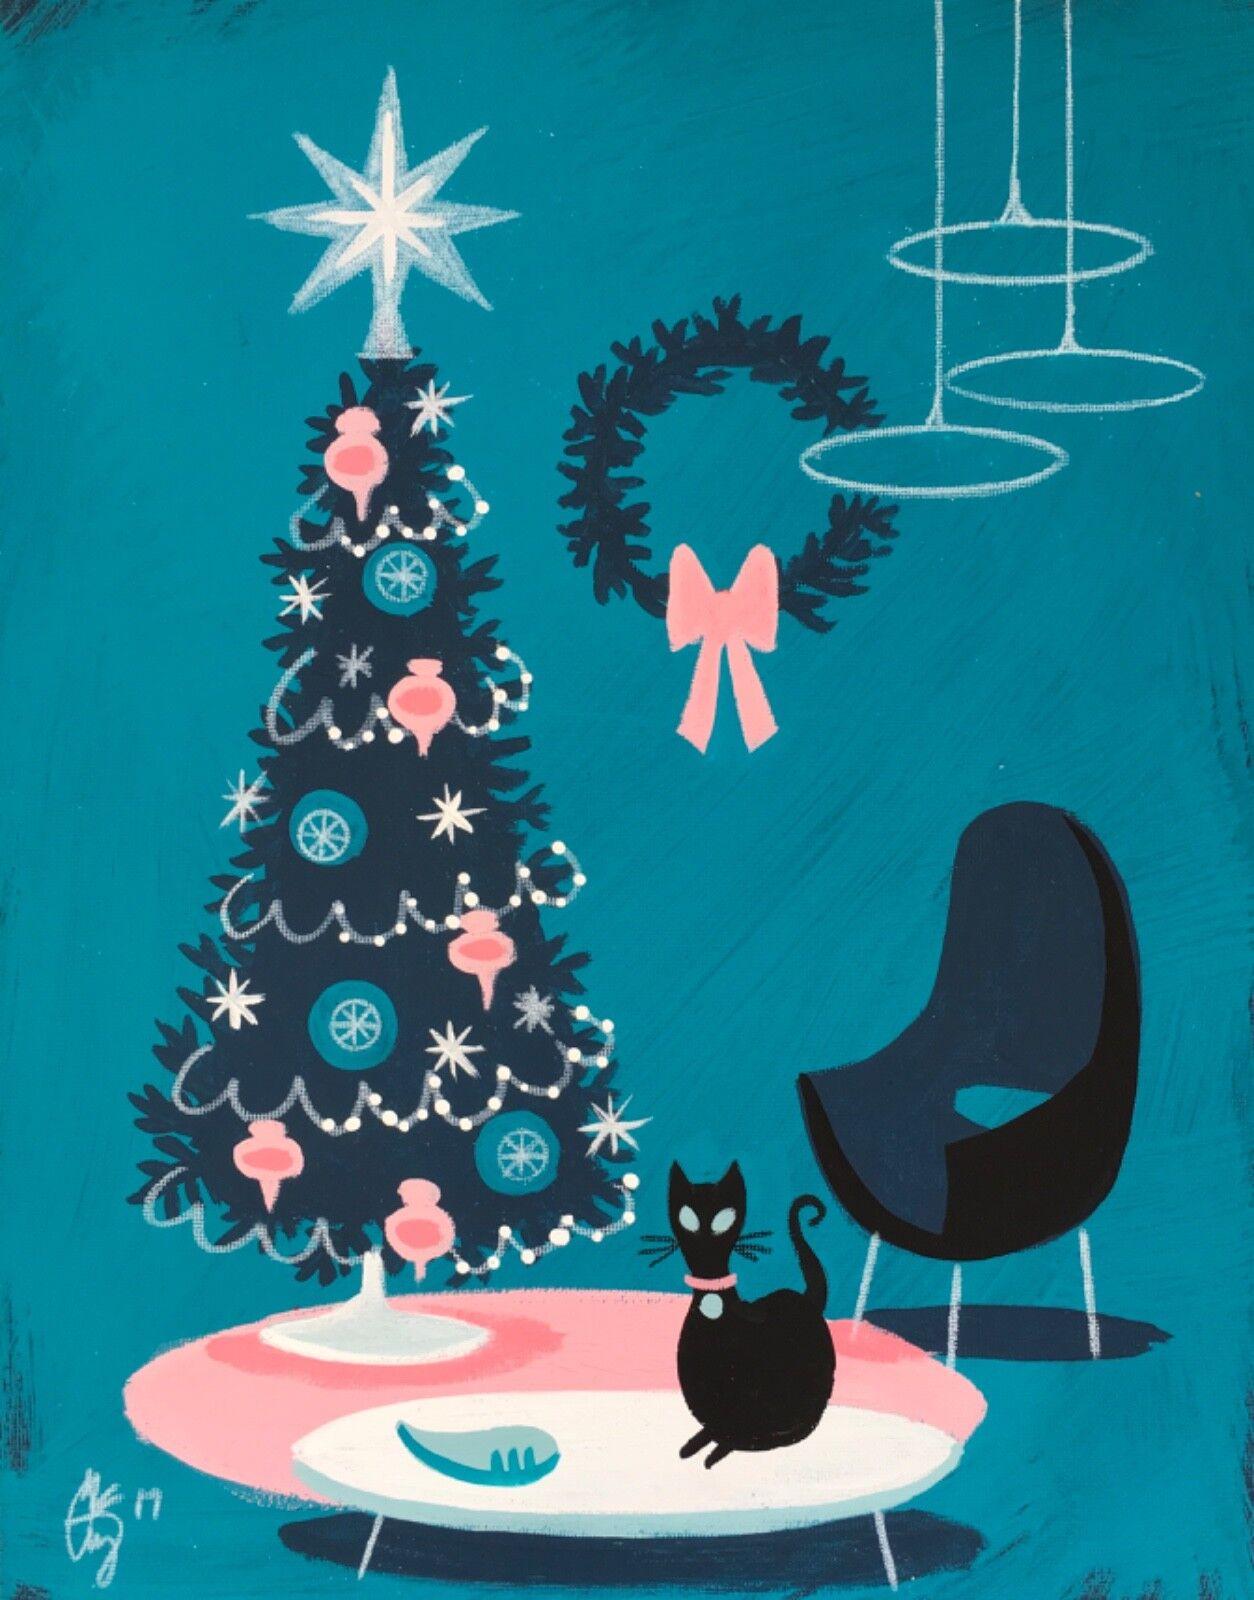 Купить EL GATO GOMEZ RETRO VINTAGE CHRISTMAS TREE HOLIDAY MID CENTURY MODERN BLACK CAT